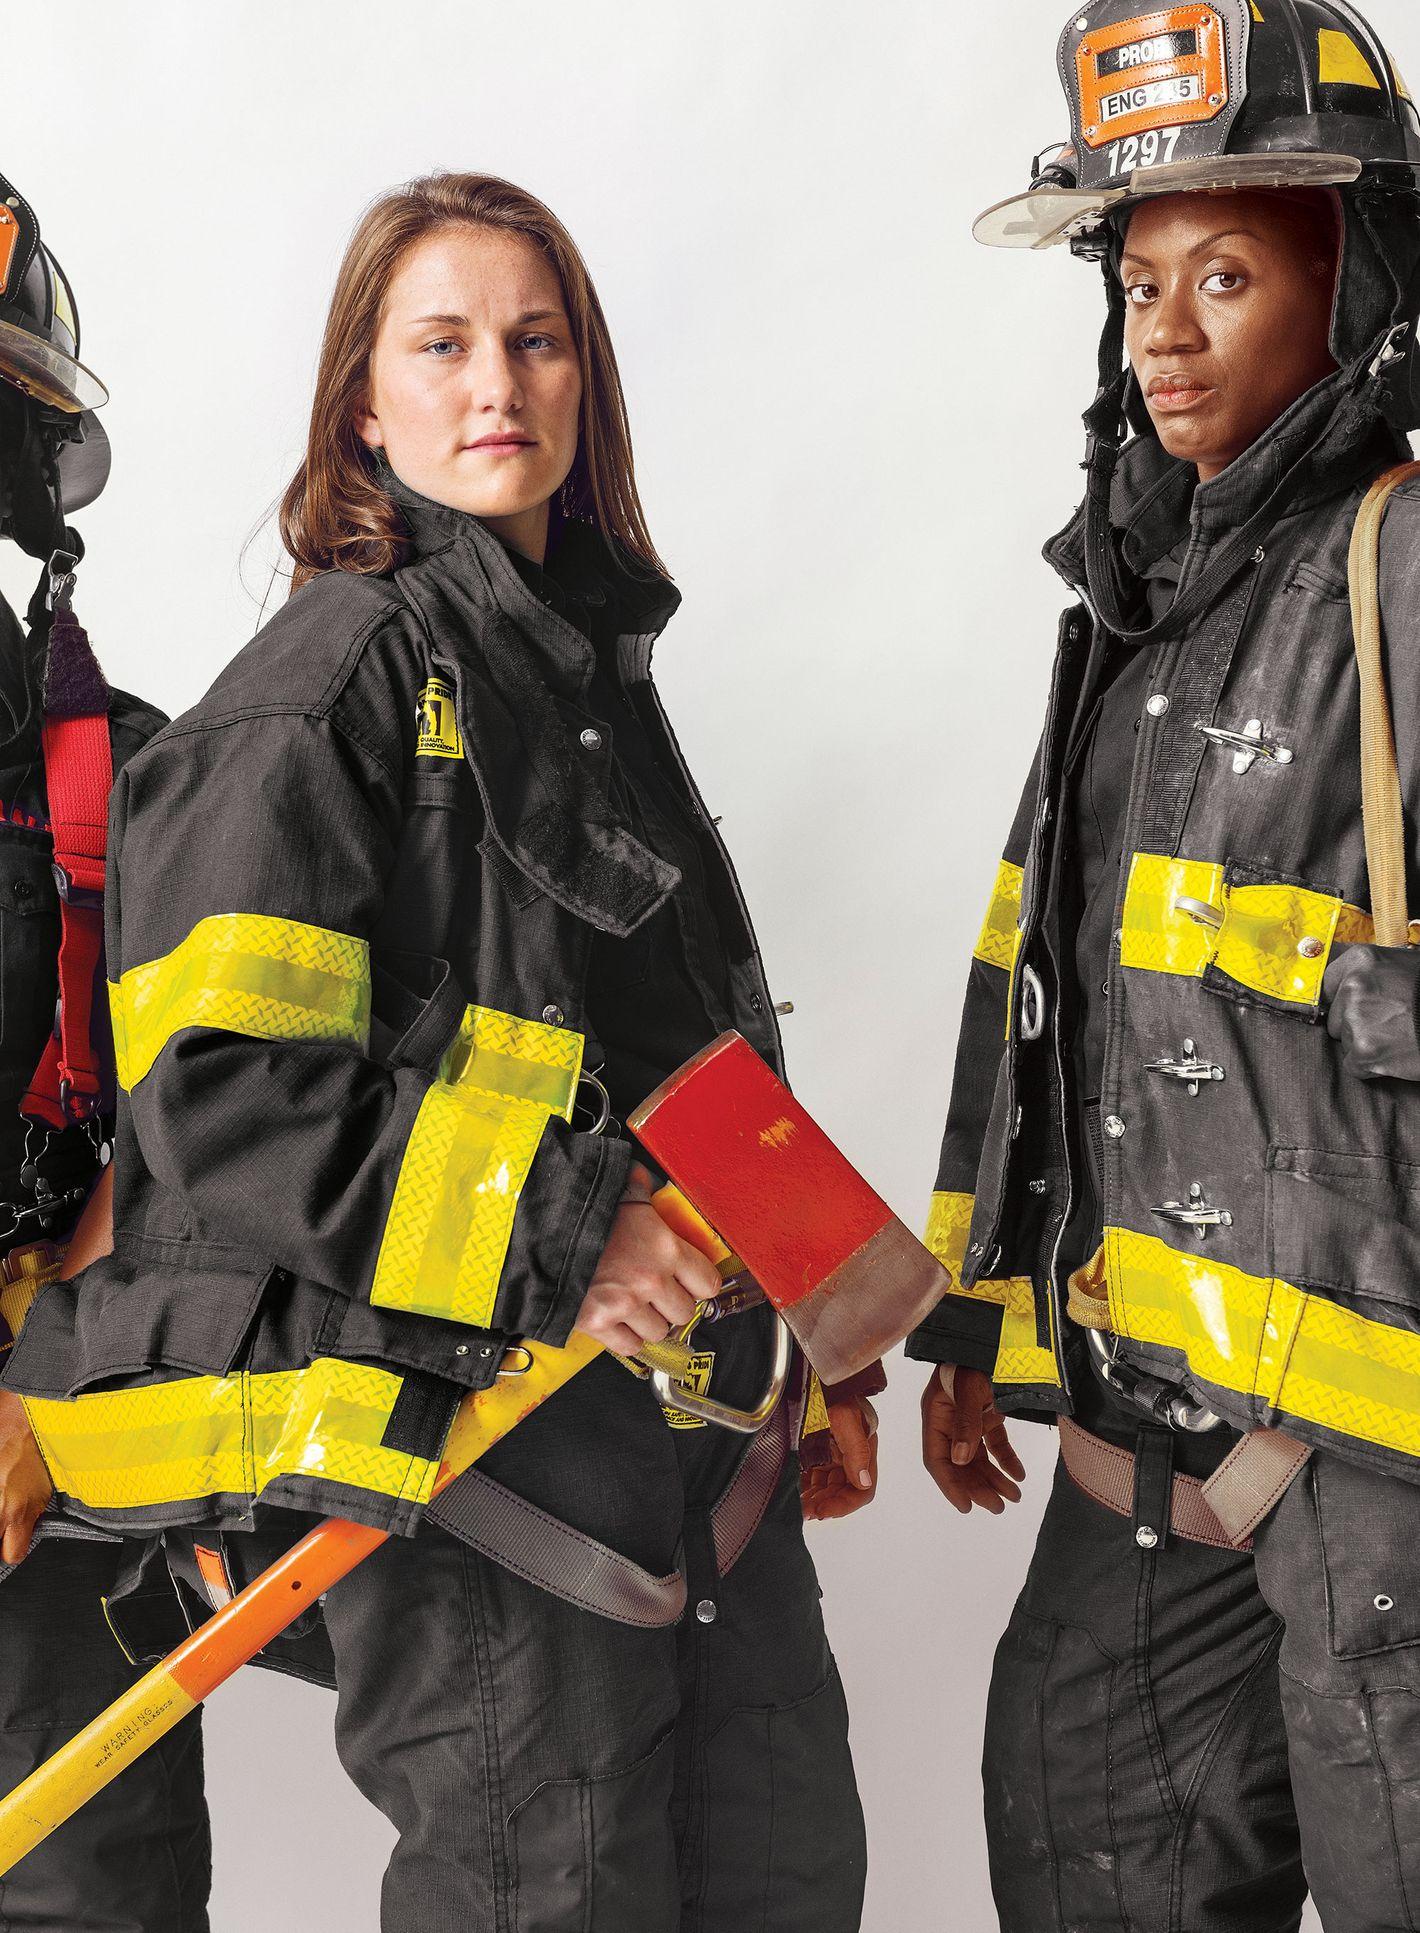 kentucky-firefighter-girl-beauty-bugbane-free